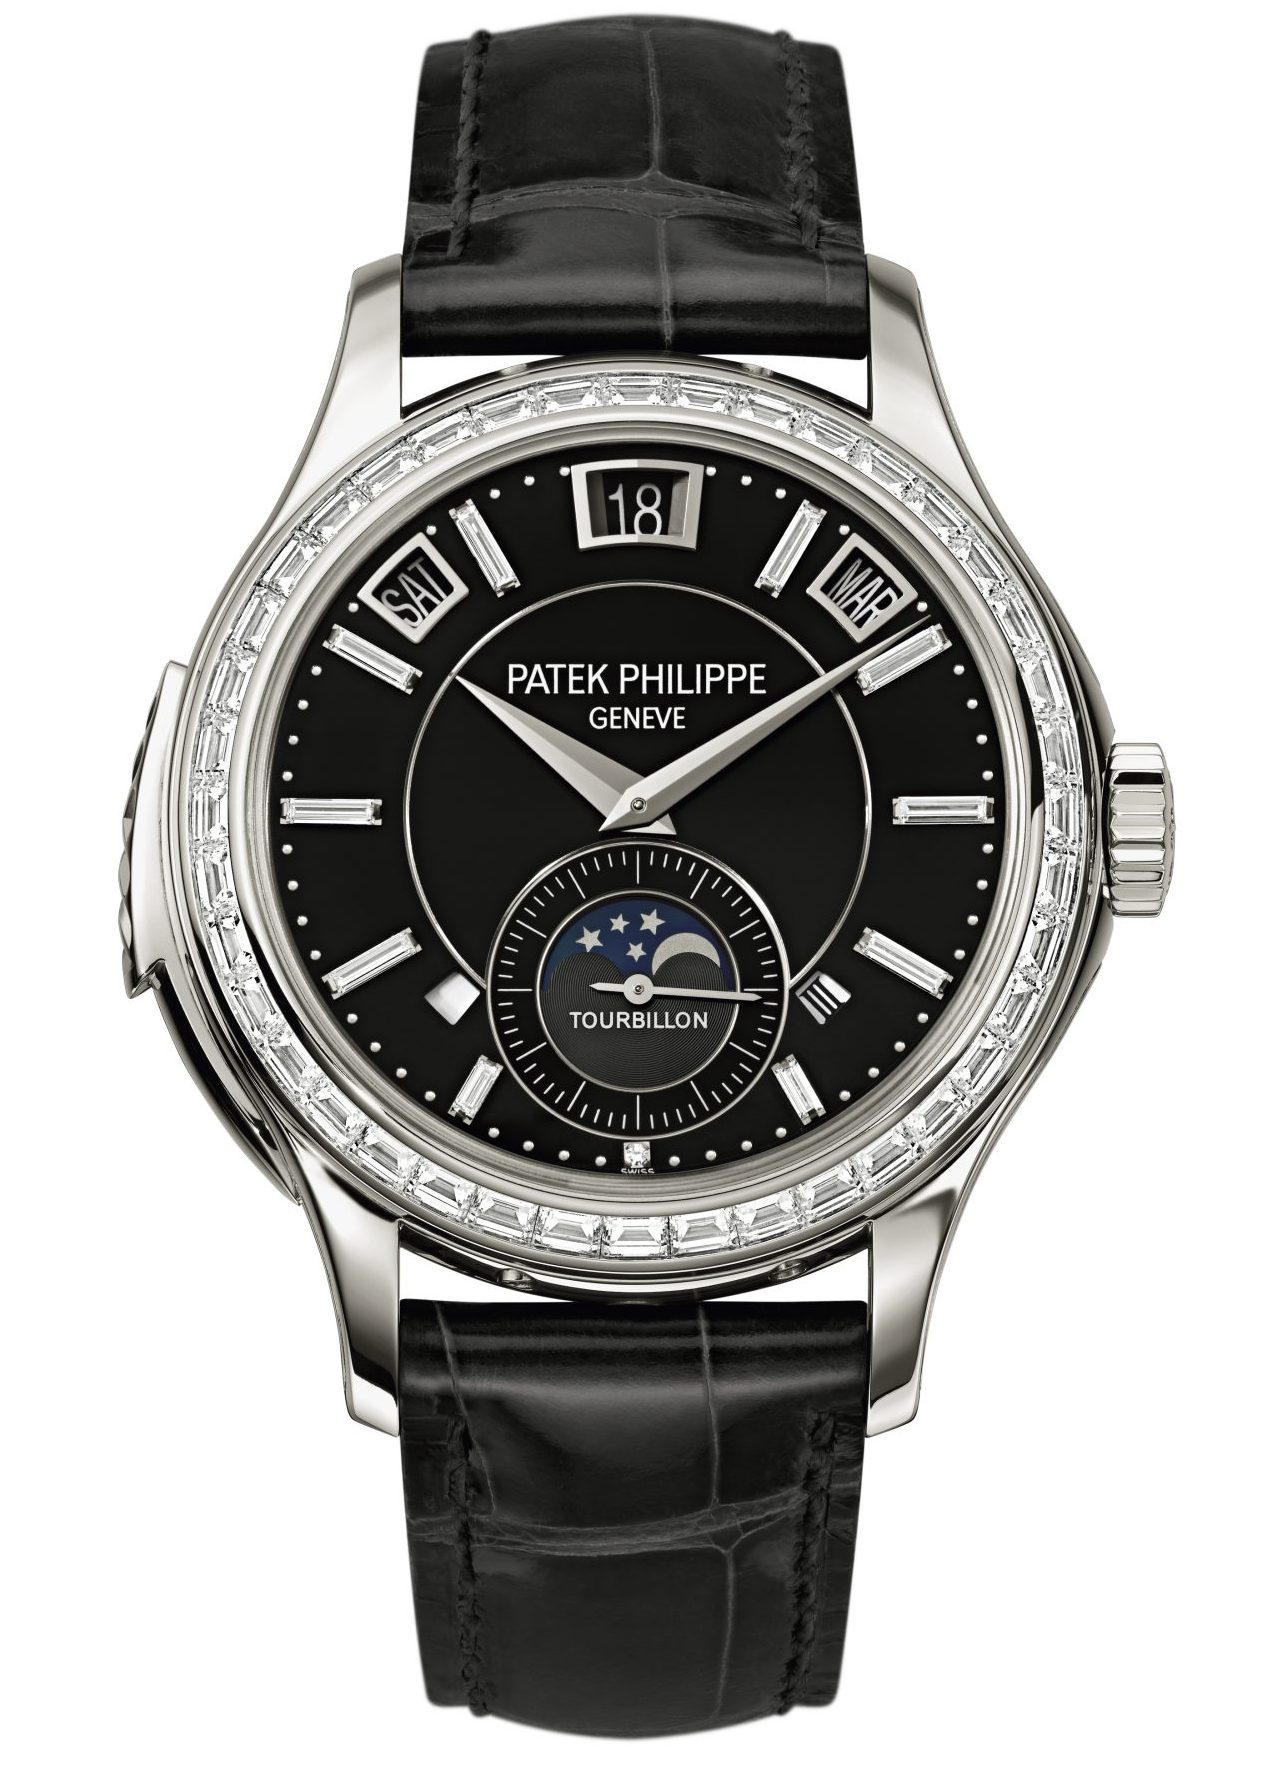 PATEK PHILIPPE SA - Grand Complications Ref. 5307P-001 Platinum